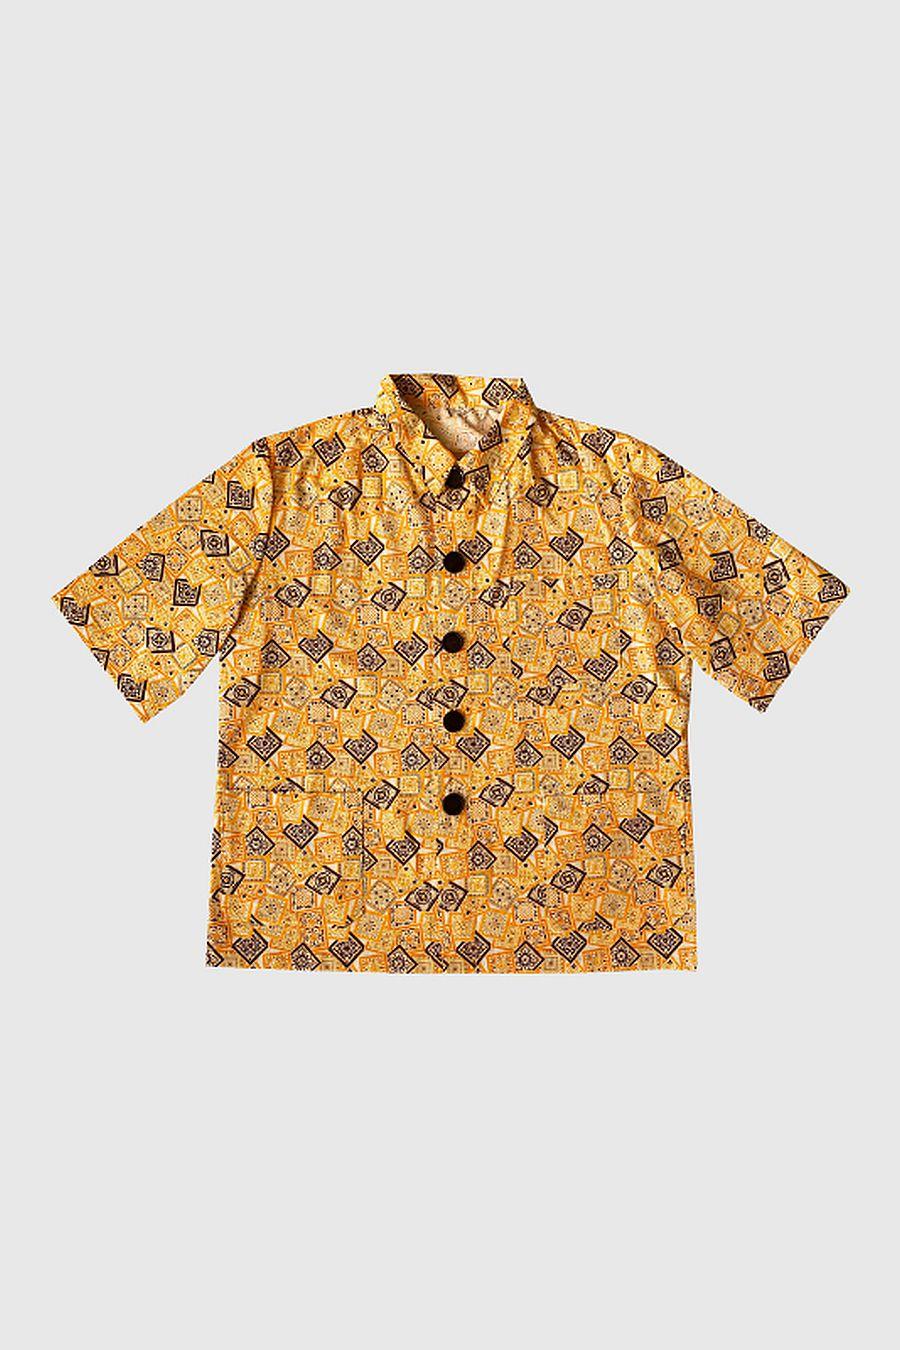 The Series NY Chore Shirt - CSCH004